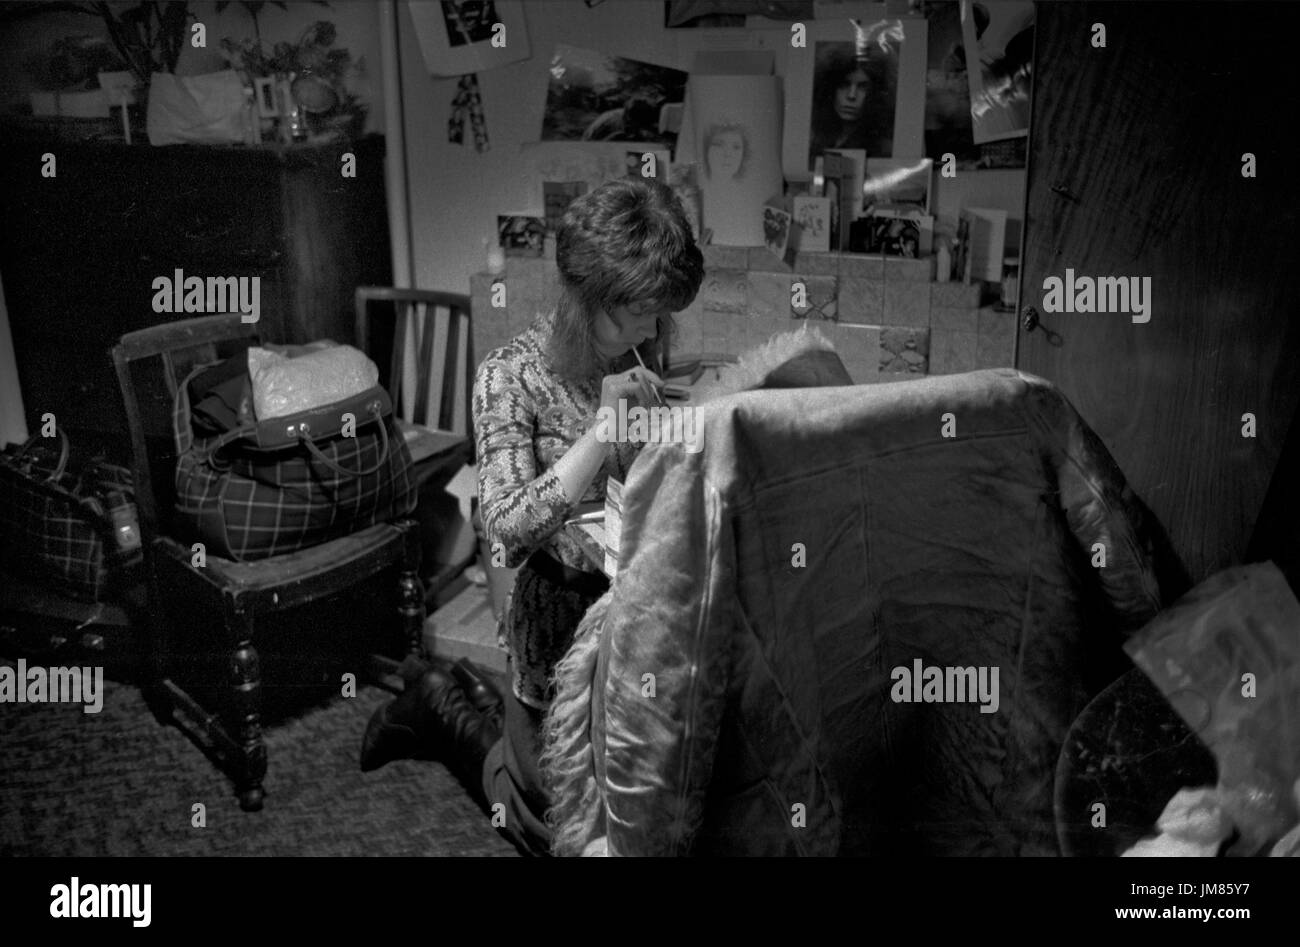 1970s student living in cheap bed sitter bedsitter London flat. HOMER SYKES - Stock Image